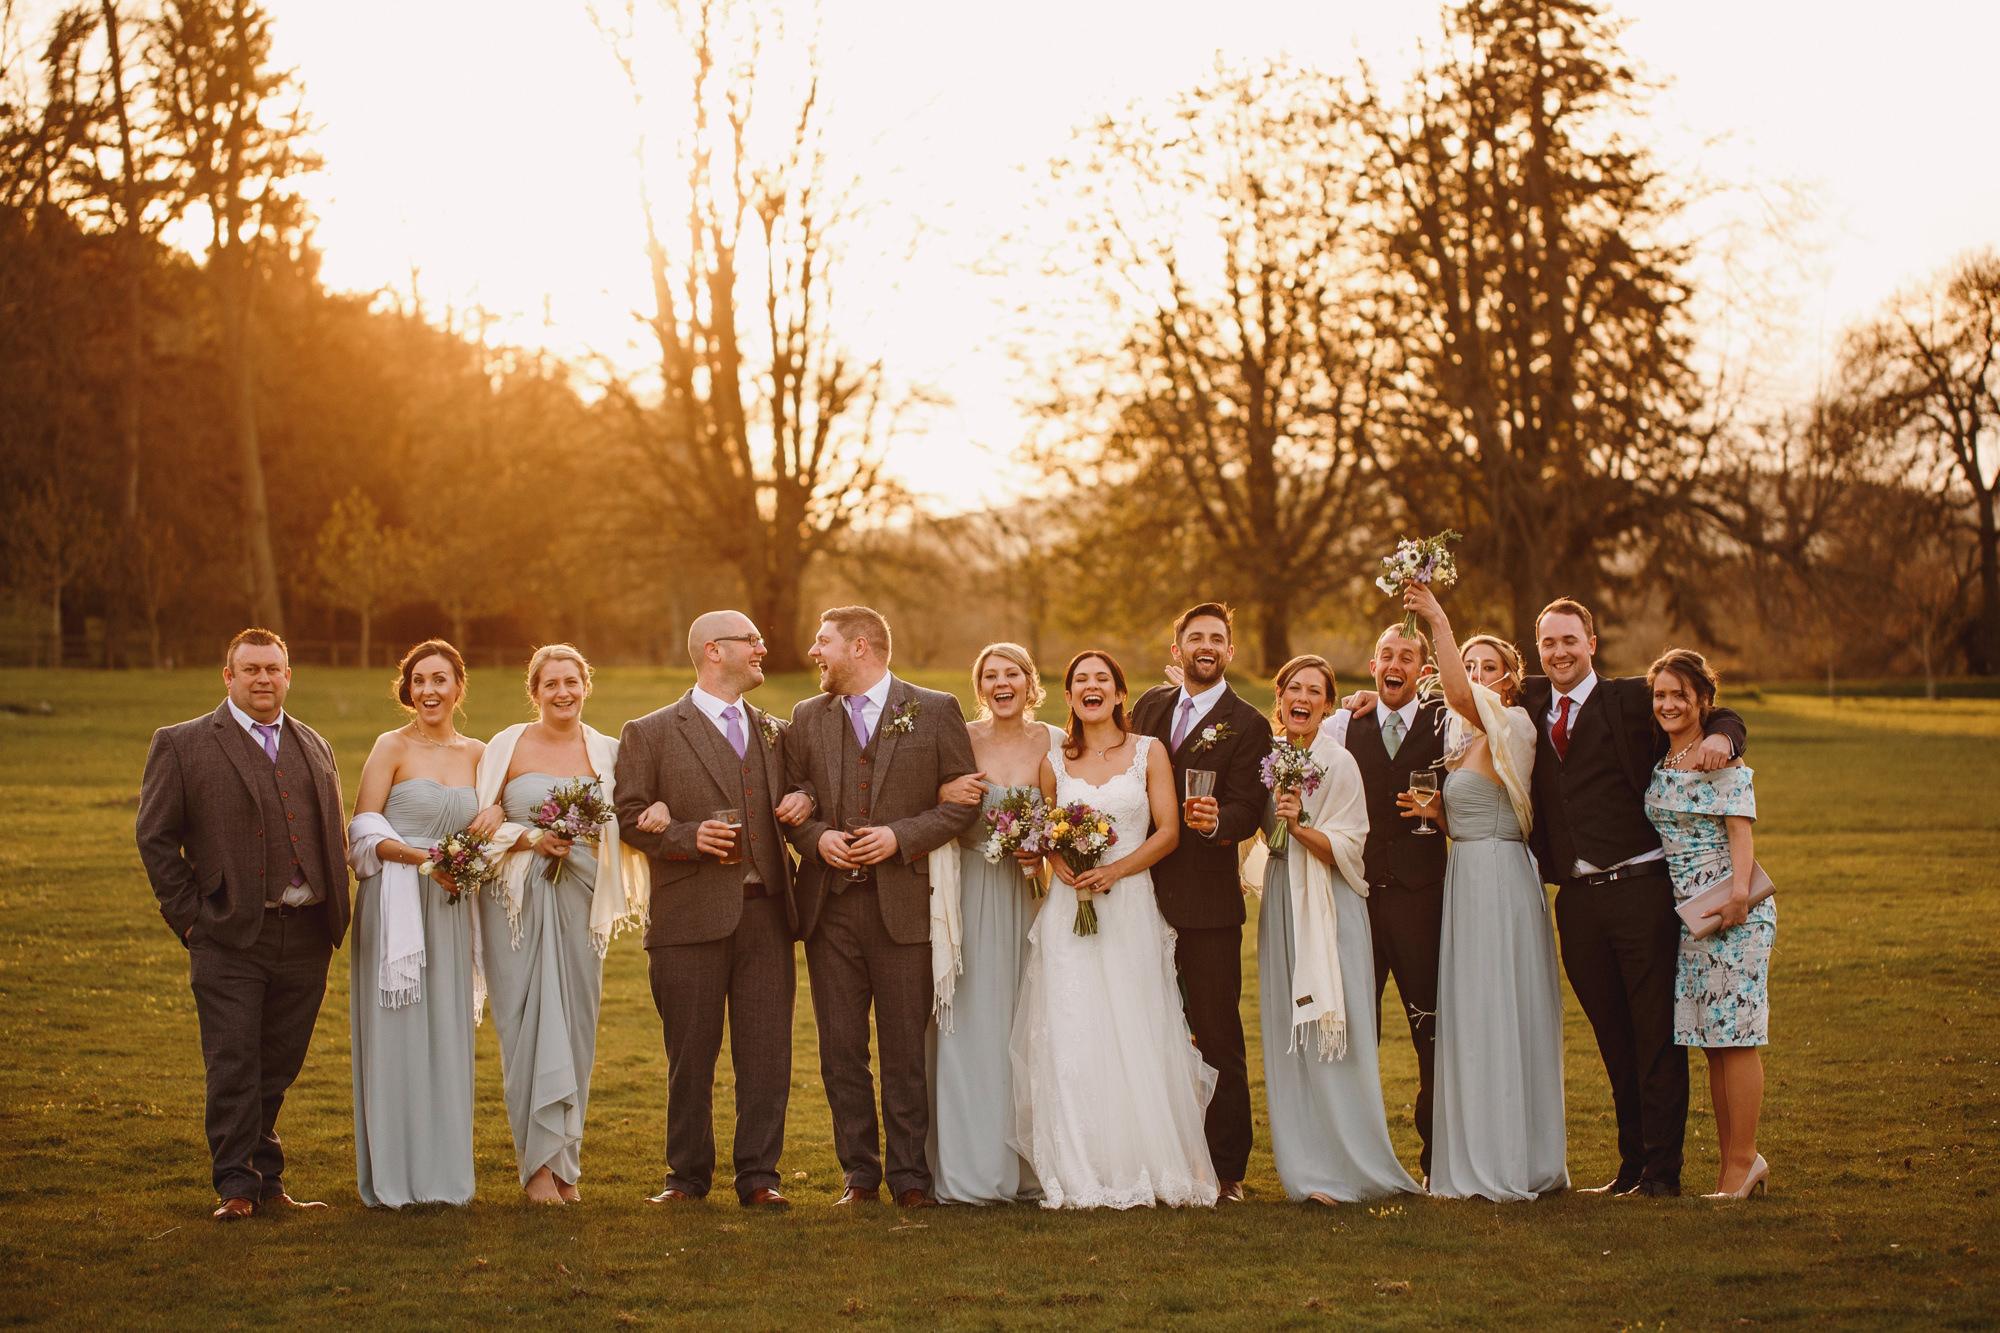 Walcot hall wedding photography shropshire 35